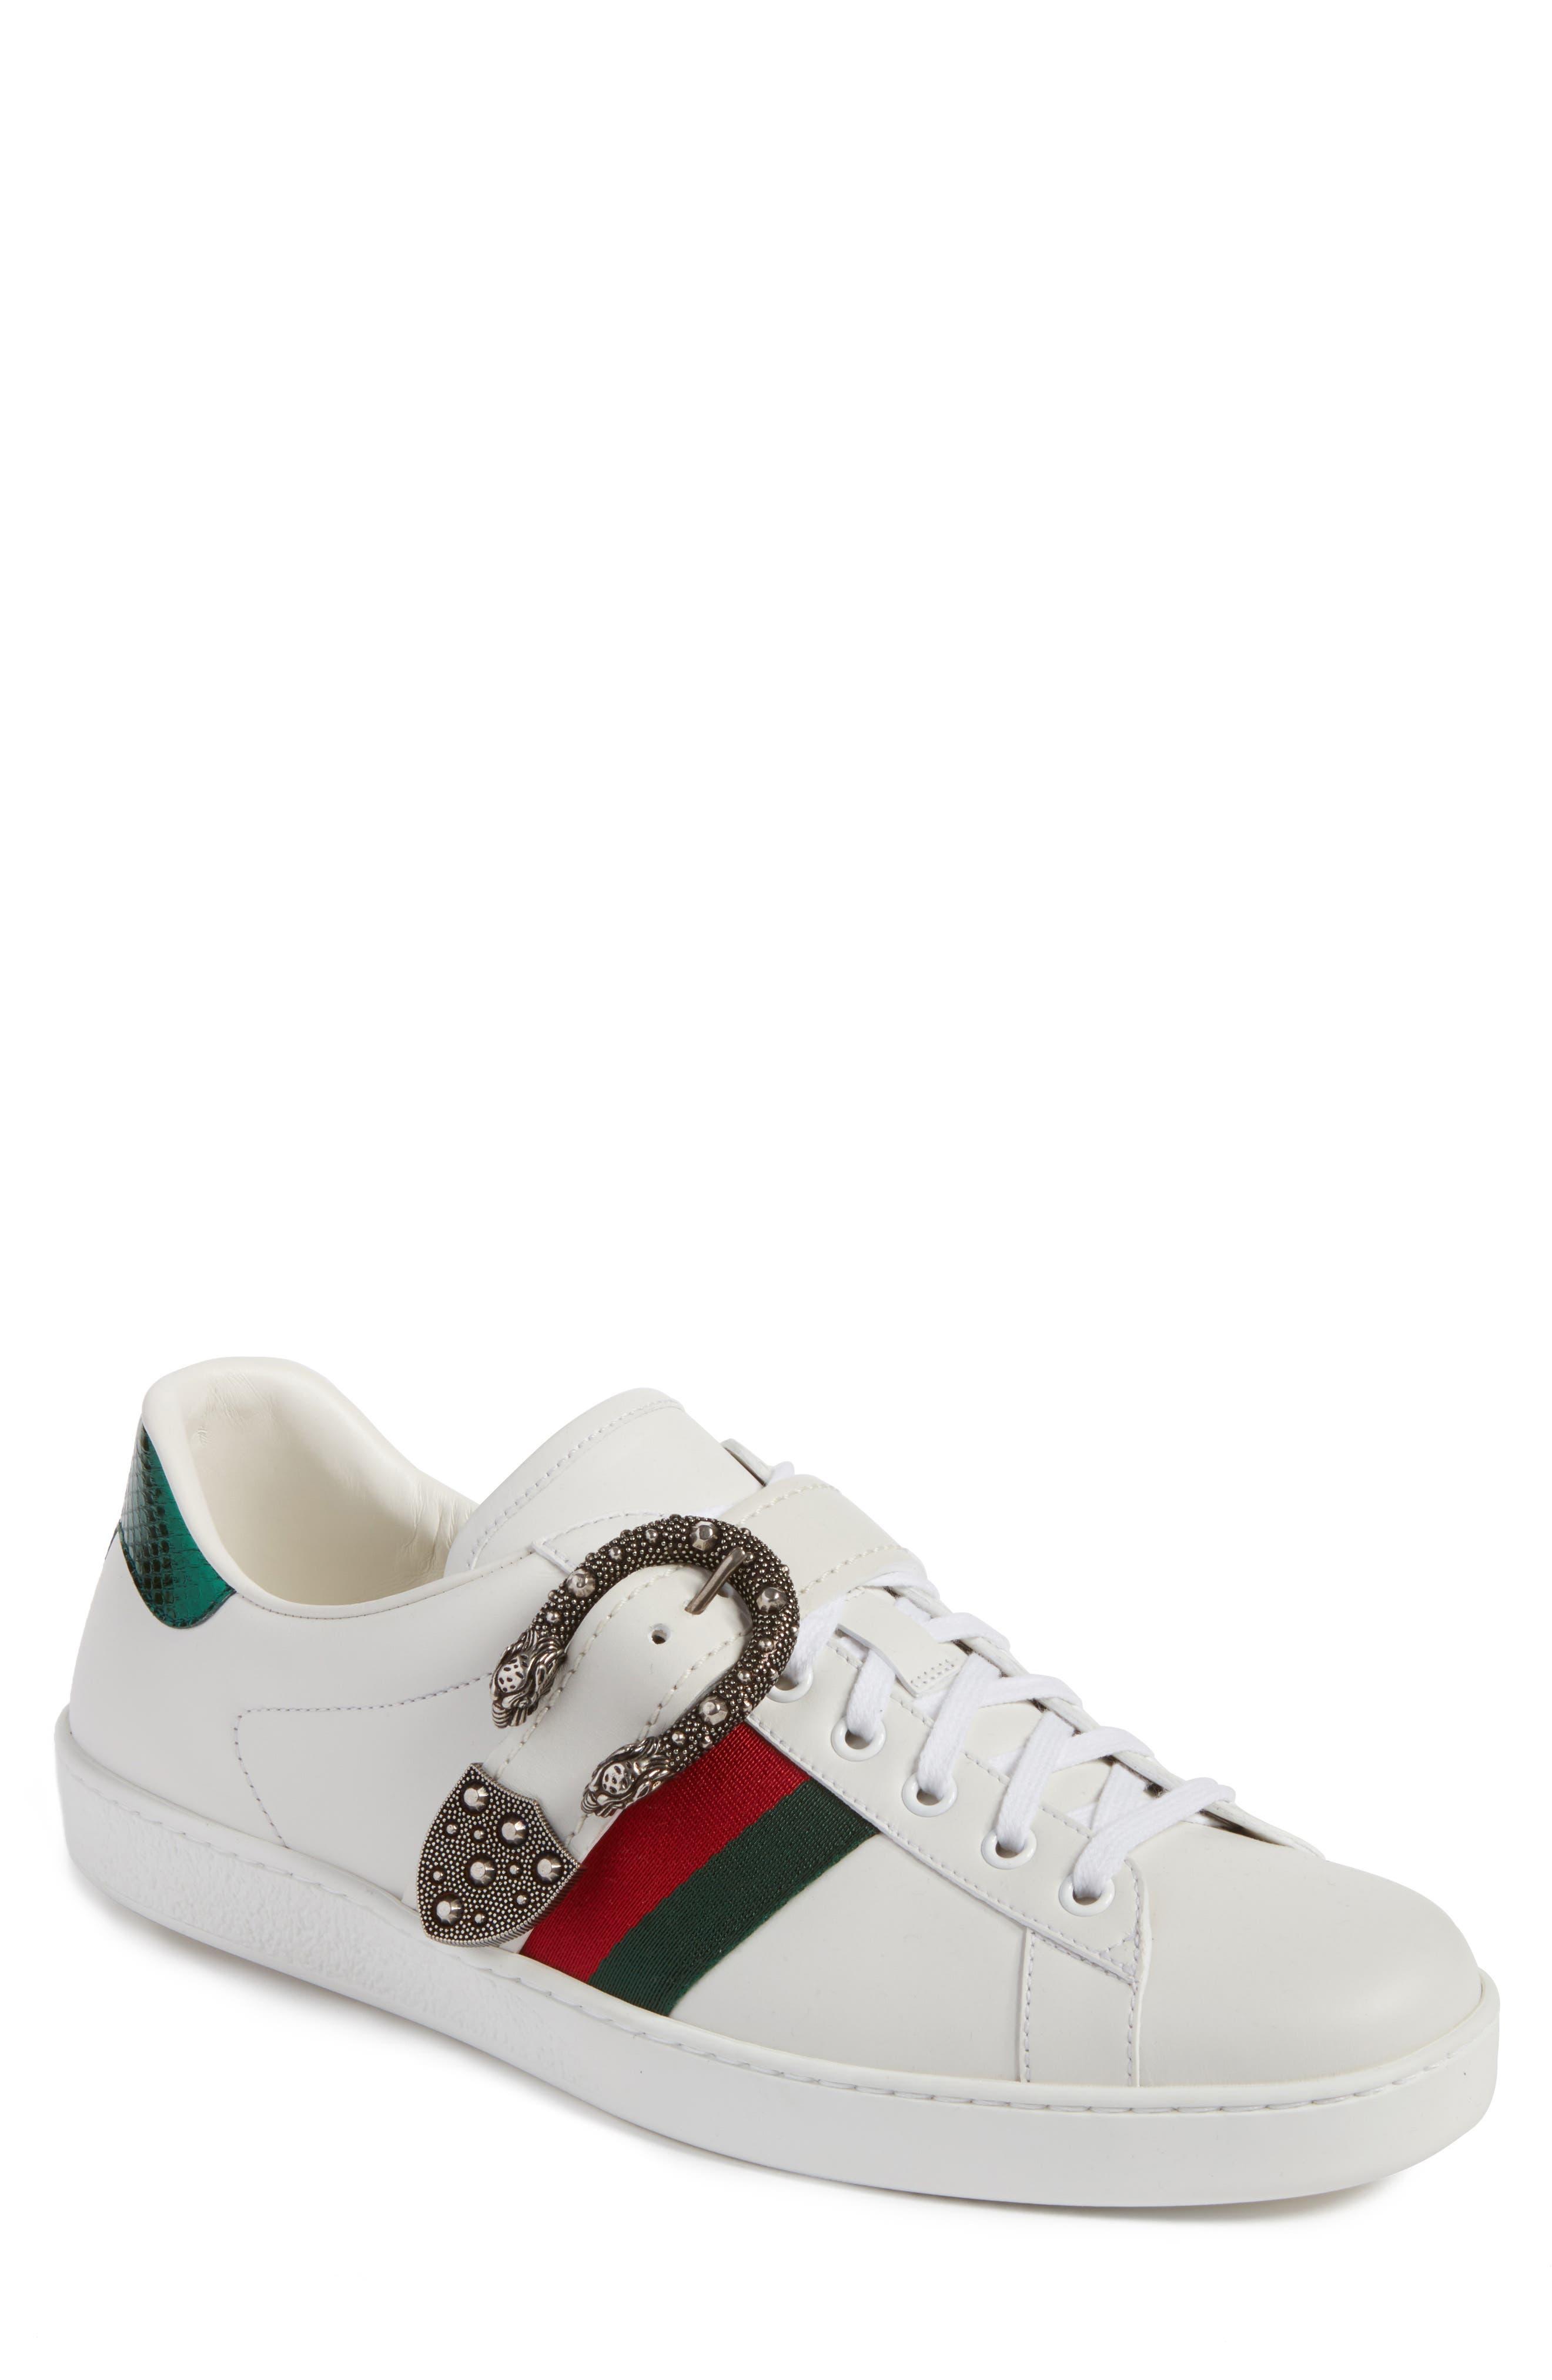 New Ace Dionysus Buckle Low Top Sneaker,                         Main,                         color, 138